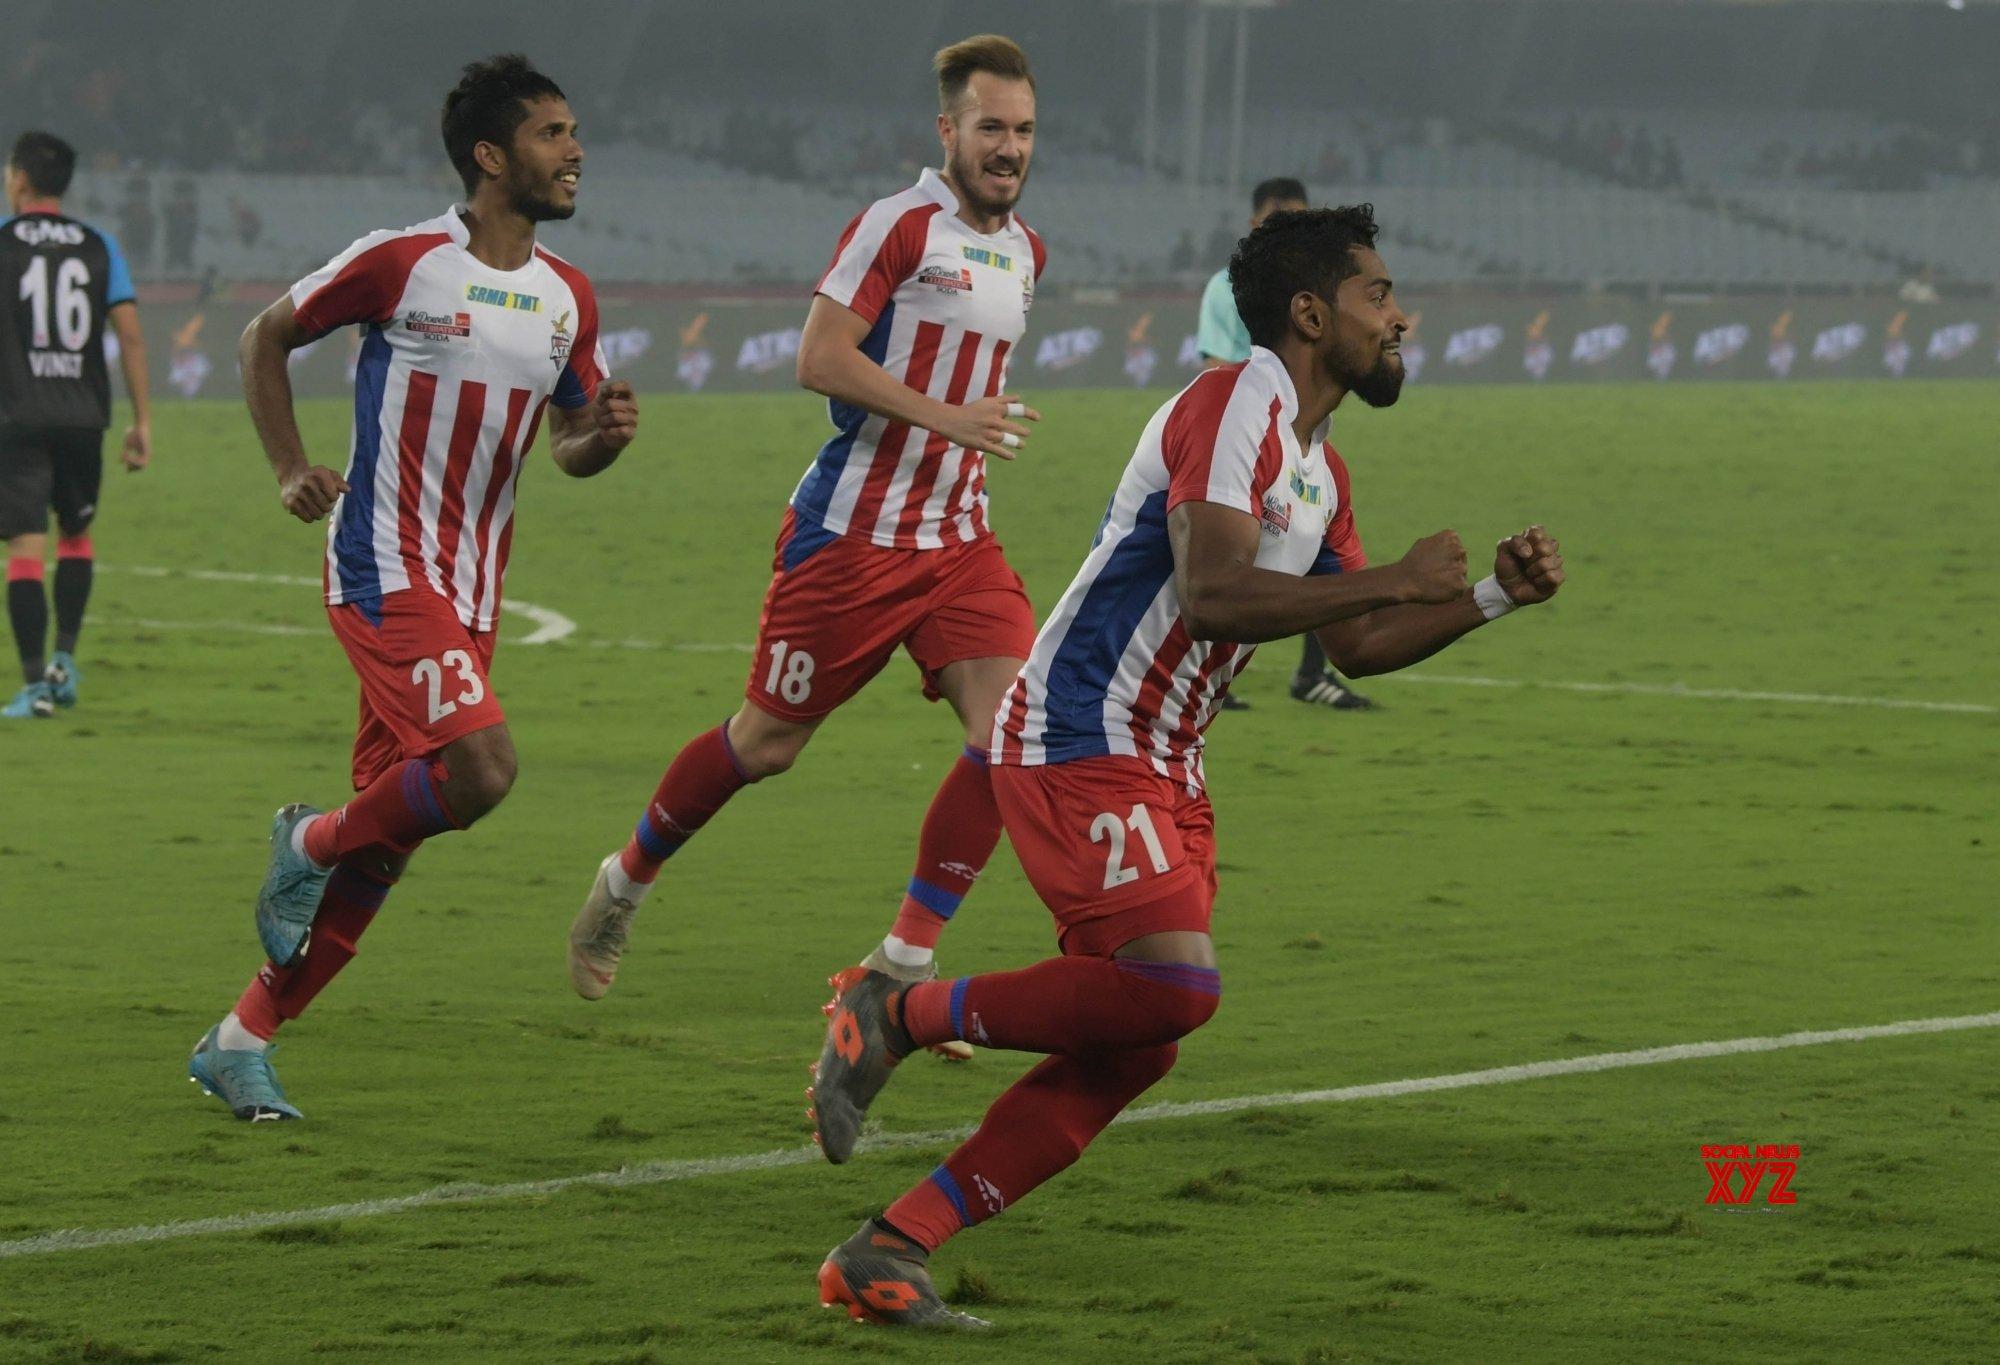 Kolkata: Indian Super League 2019 - 20: ATK Vs Odisha FC #Gallery